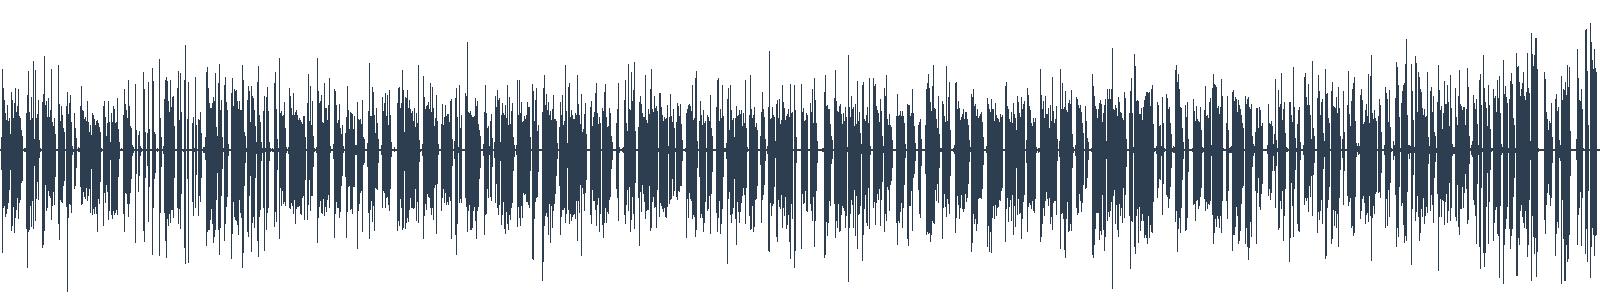 Druhá strana waveform